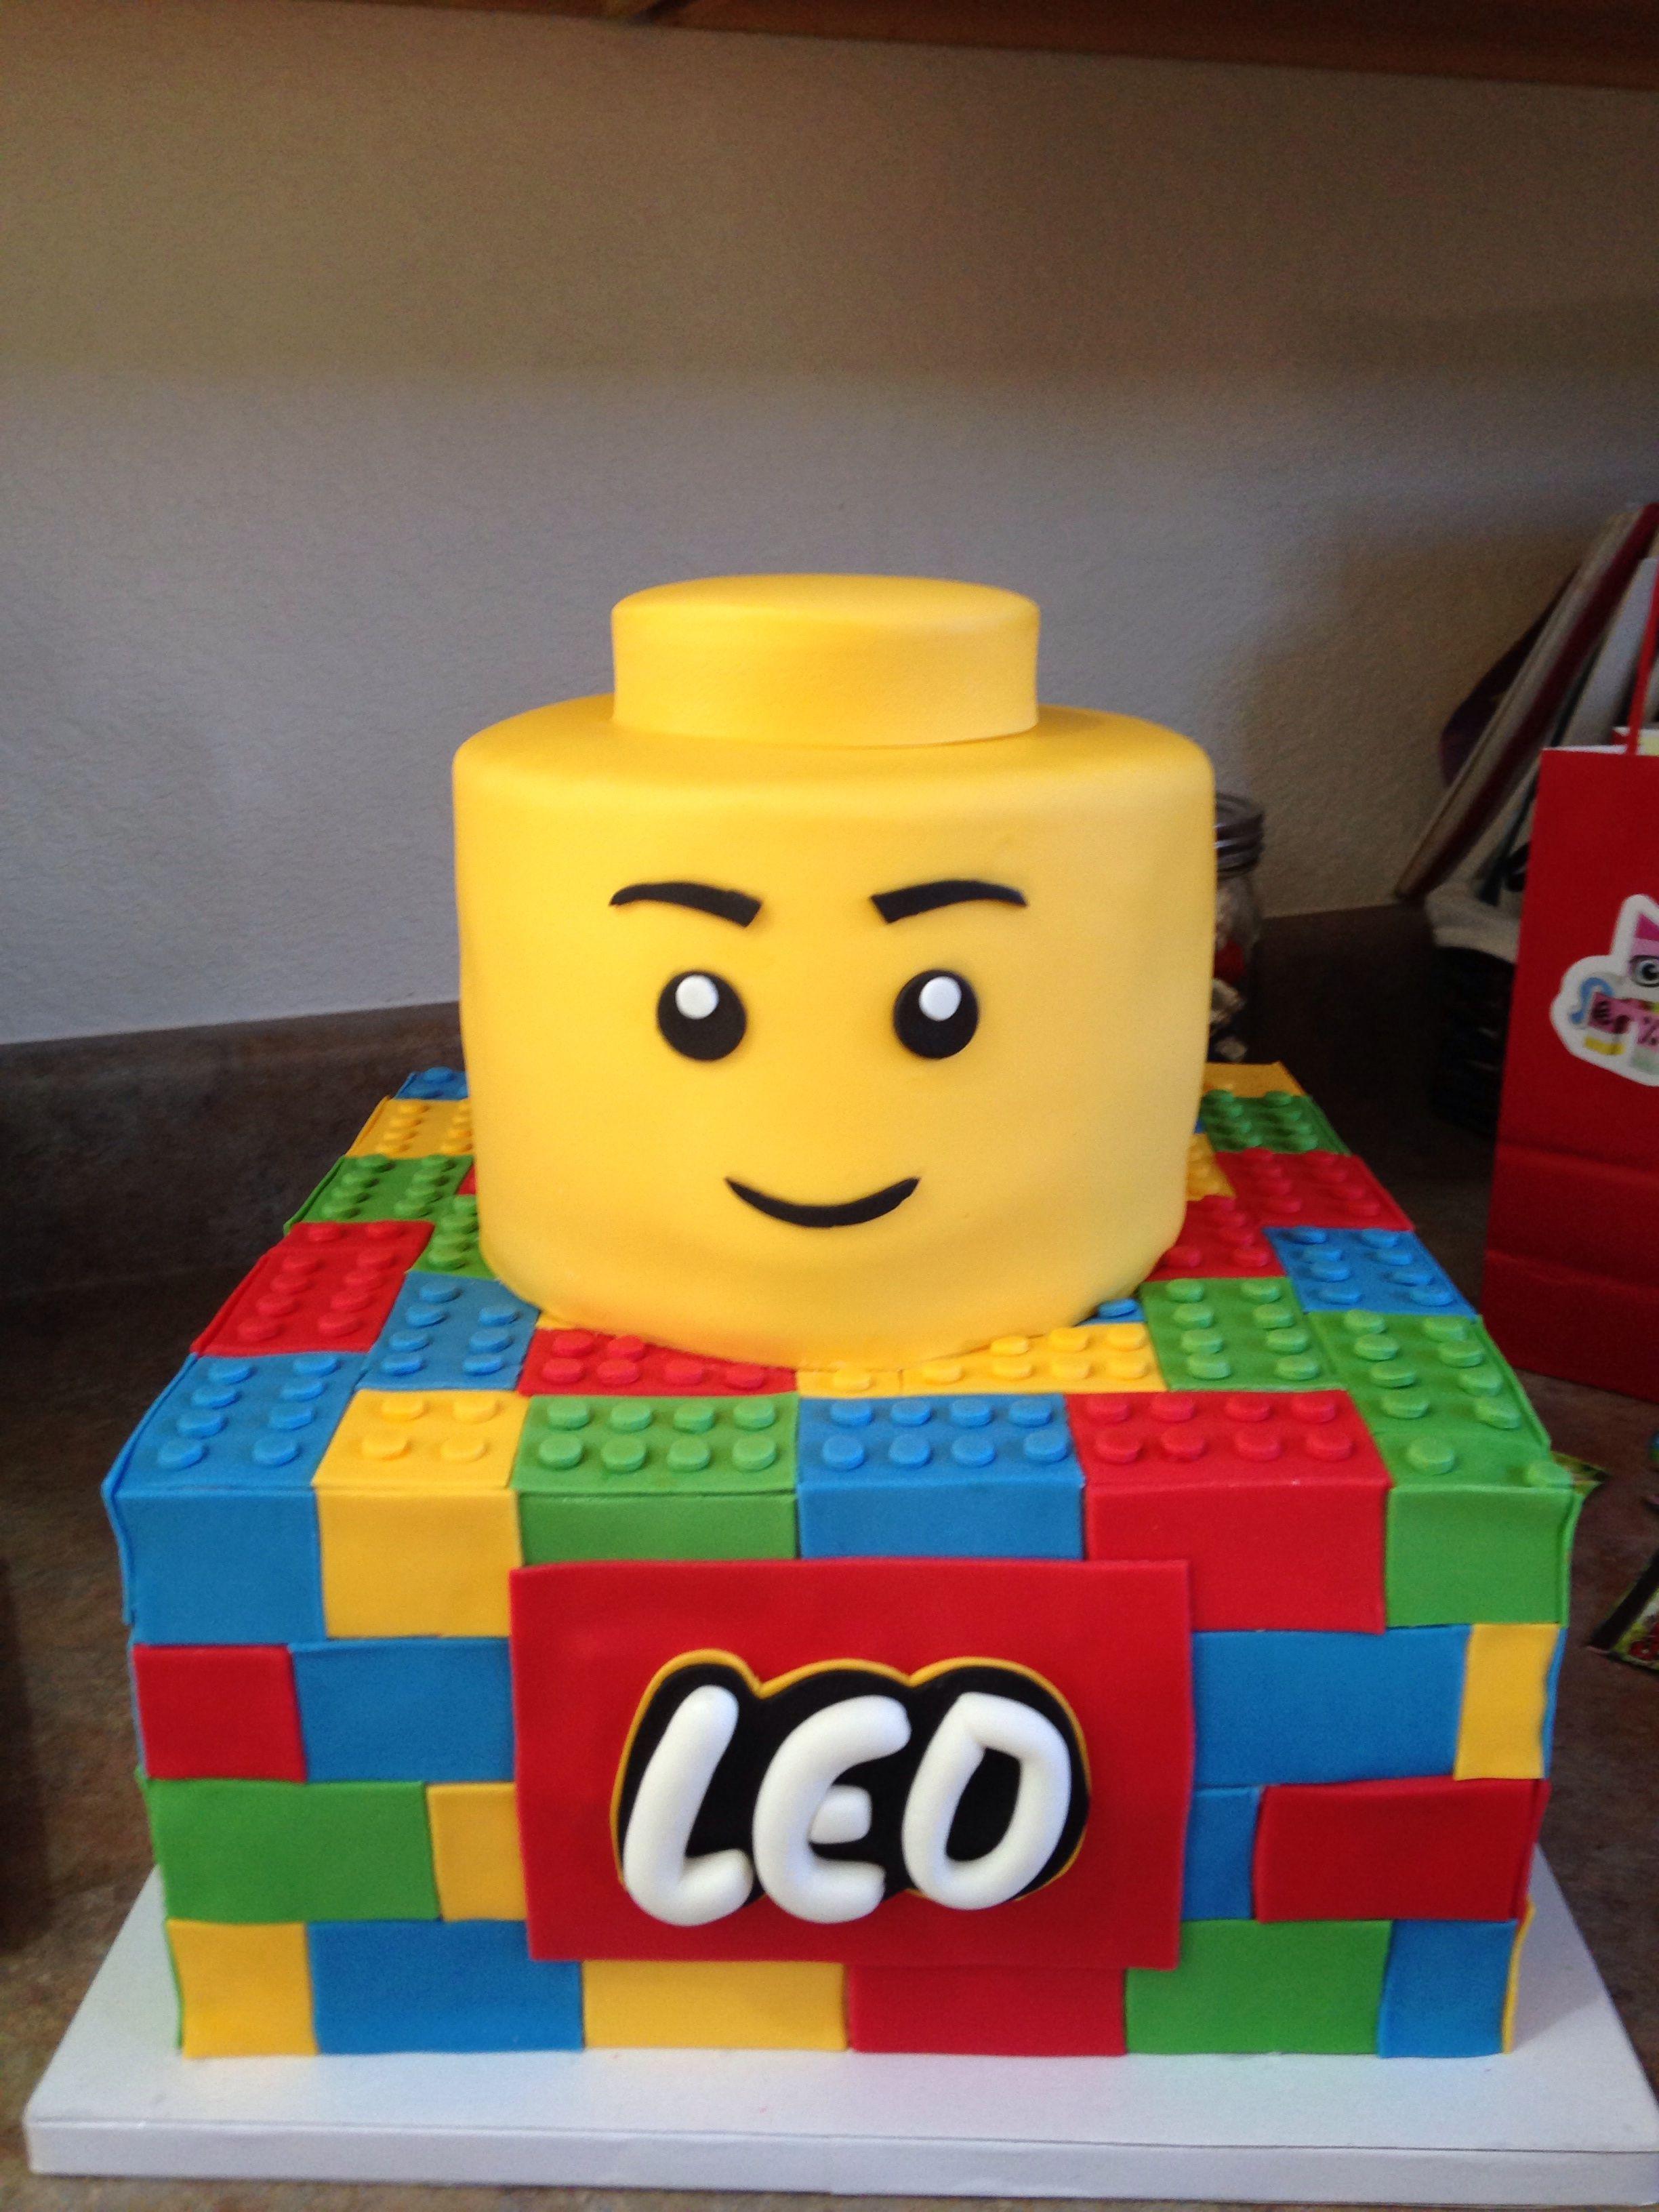 Southern Blue Celebrations Lego Cake And Birthdays - Lego birthday cake decorations